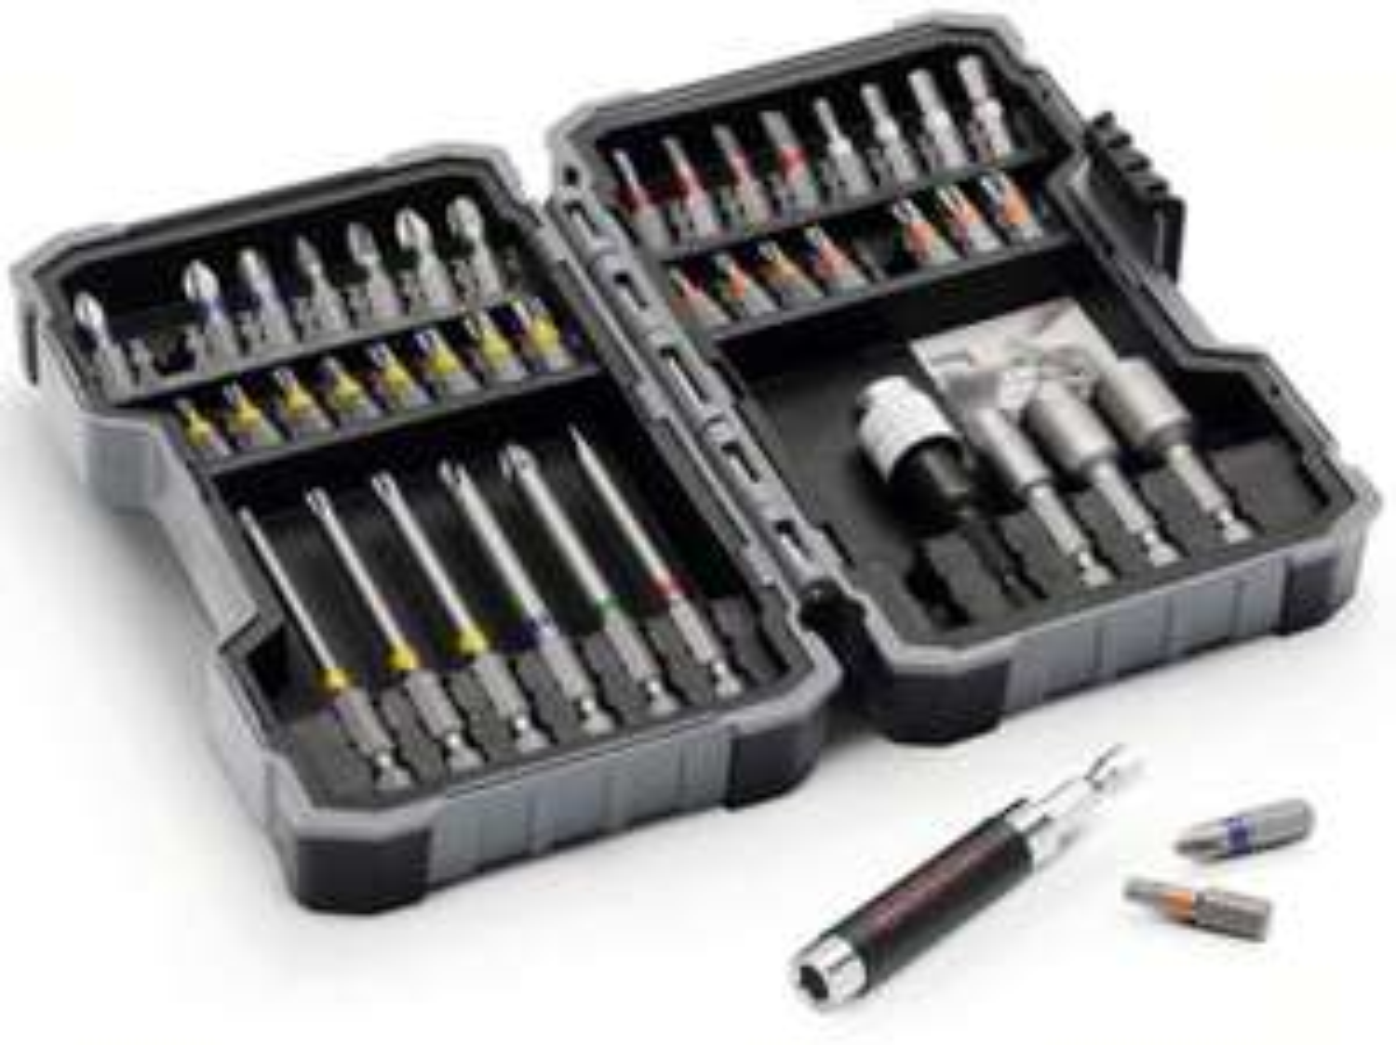 Bosch Professional 2607017164 43tlg Schrauber Bit Set (Amazon Prime)